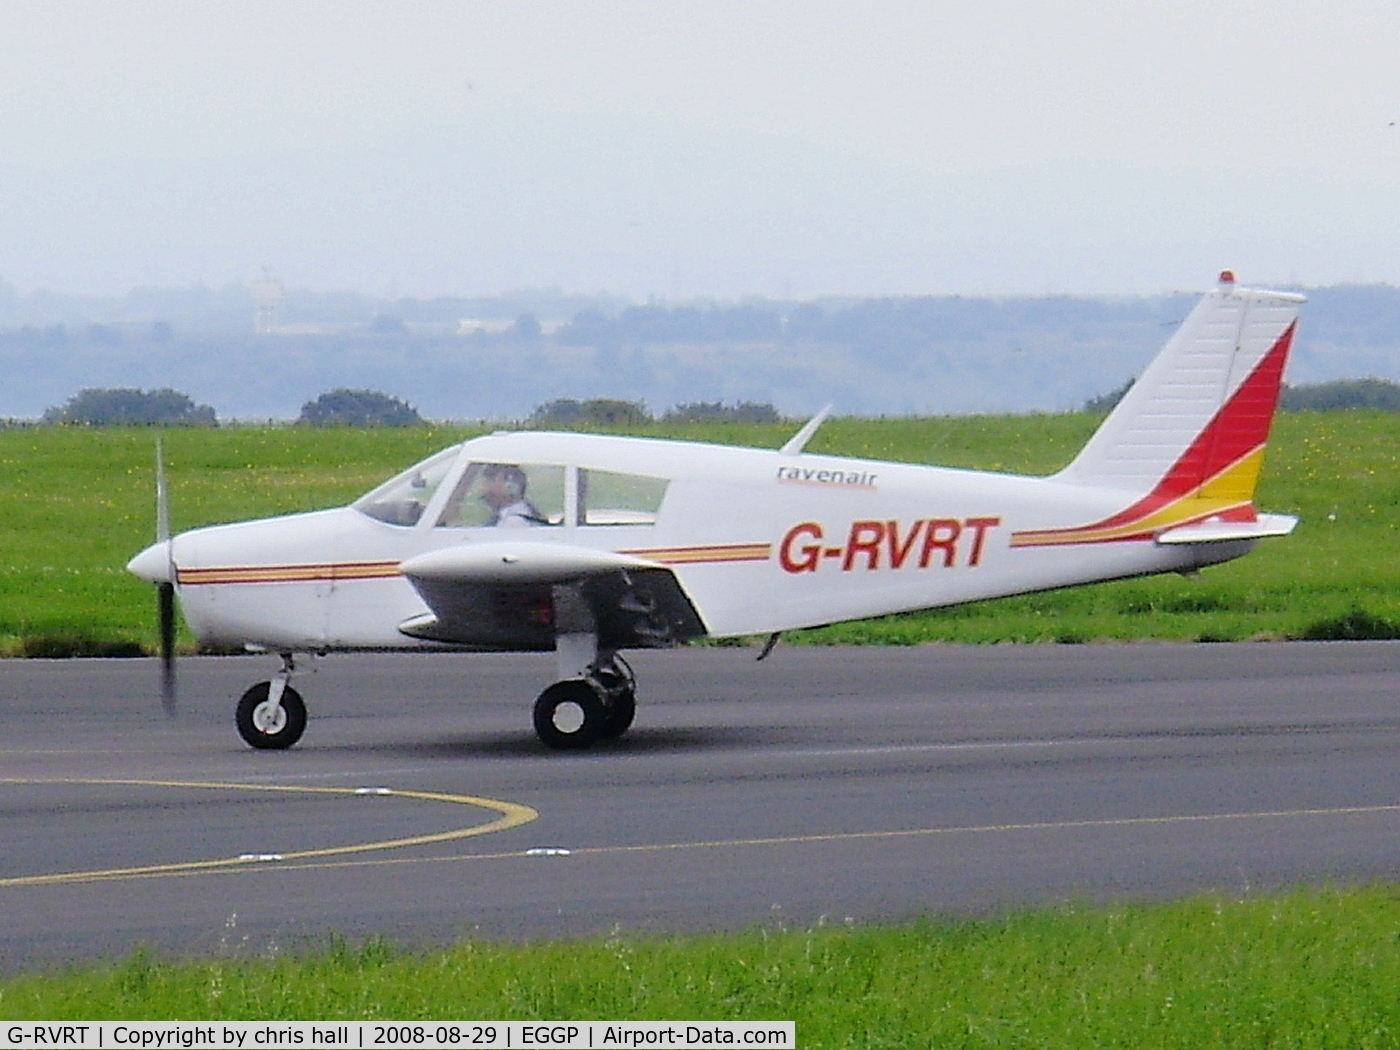 G-RVRT, 1970 Piper PA-28-140 Cherokee C/N 28-26933, RAVENAIR AIRCRAFT LTD, Previous ID: G-AYKX